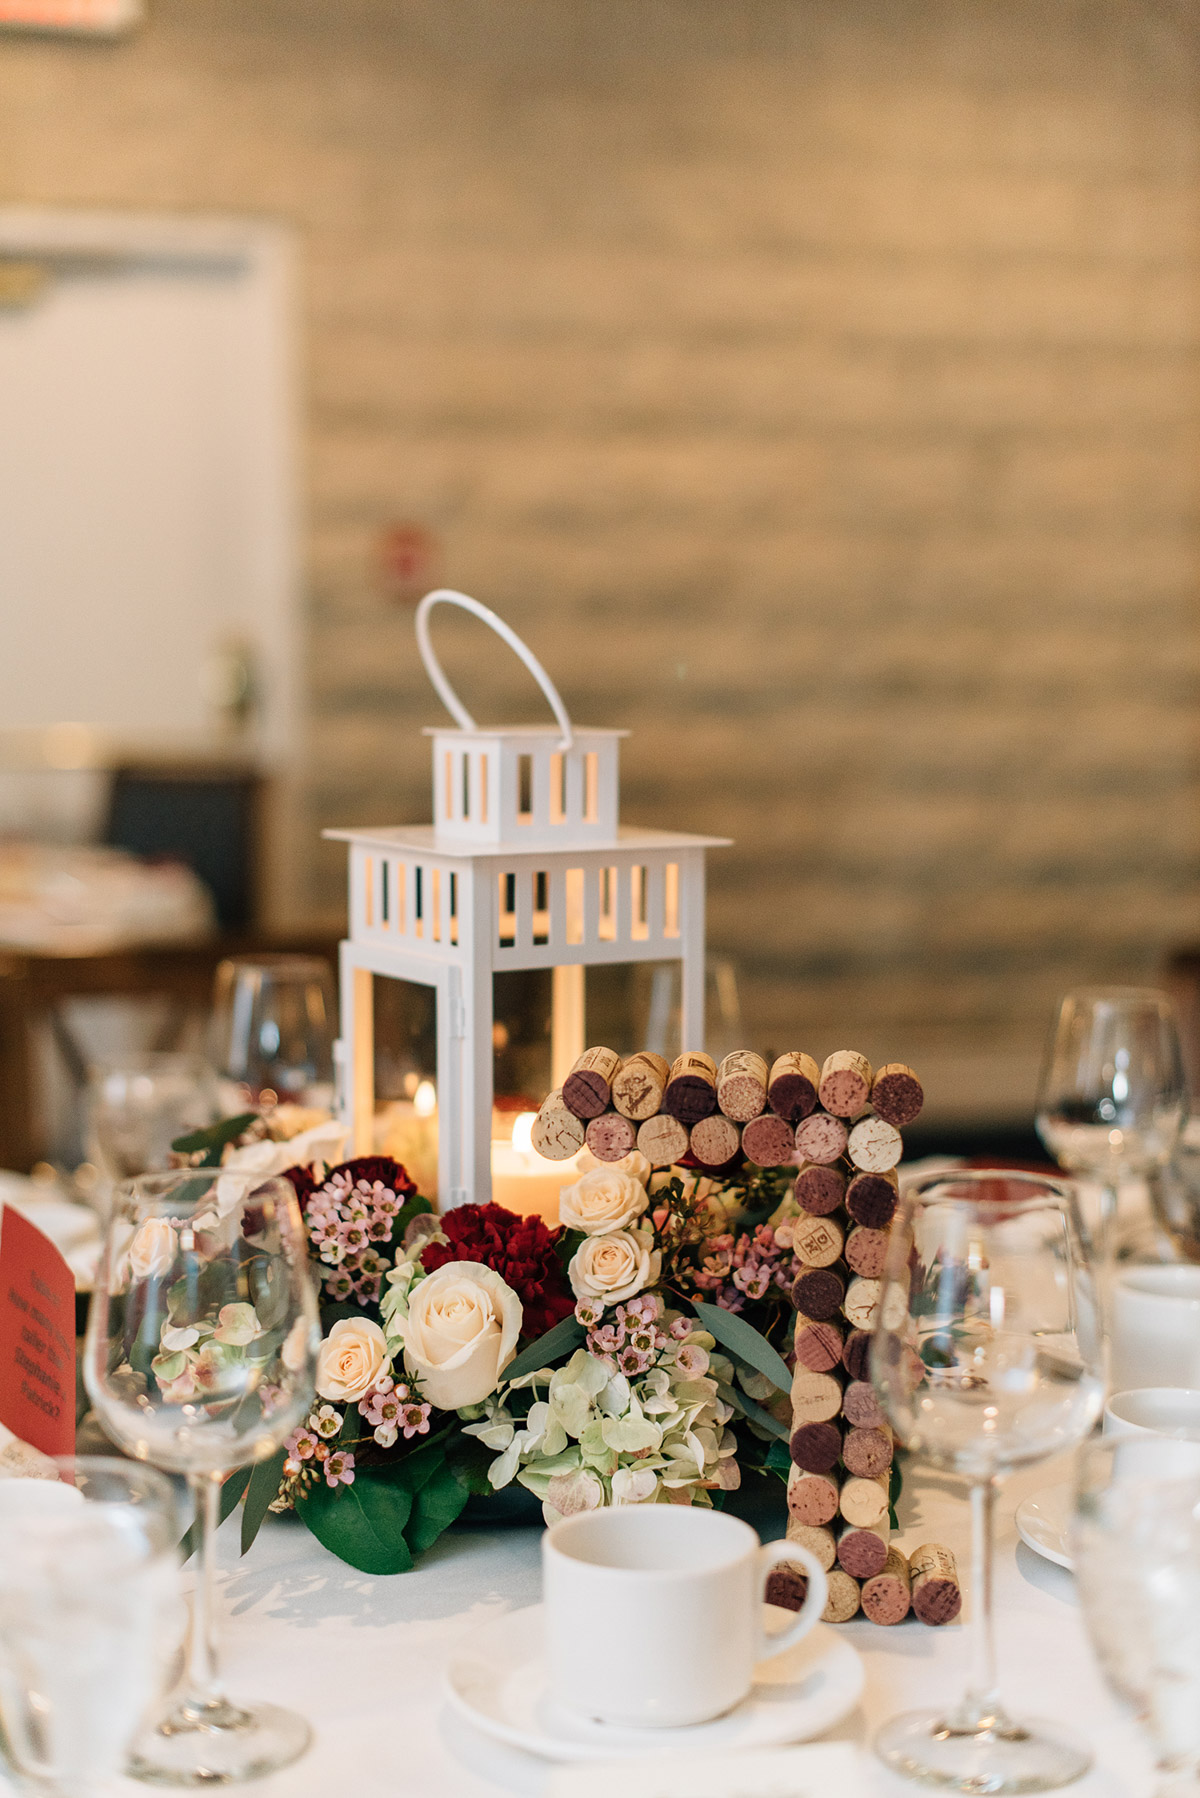 sara-wilde-photography-vineyard-bride-swish-list-inn-on-the-twenty-jordan-wedding-34.jpg